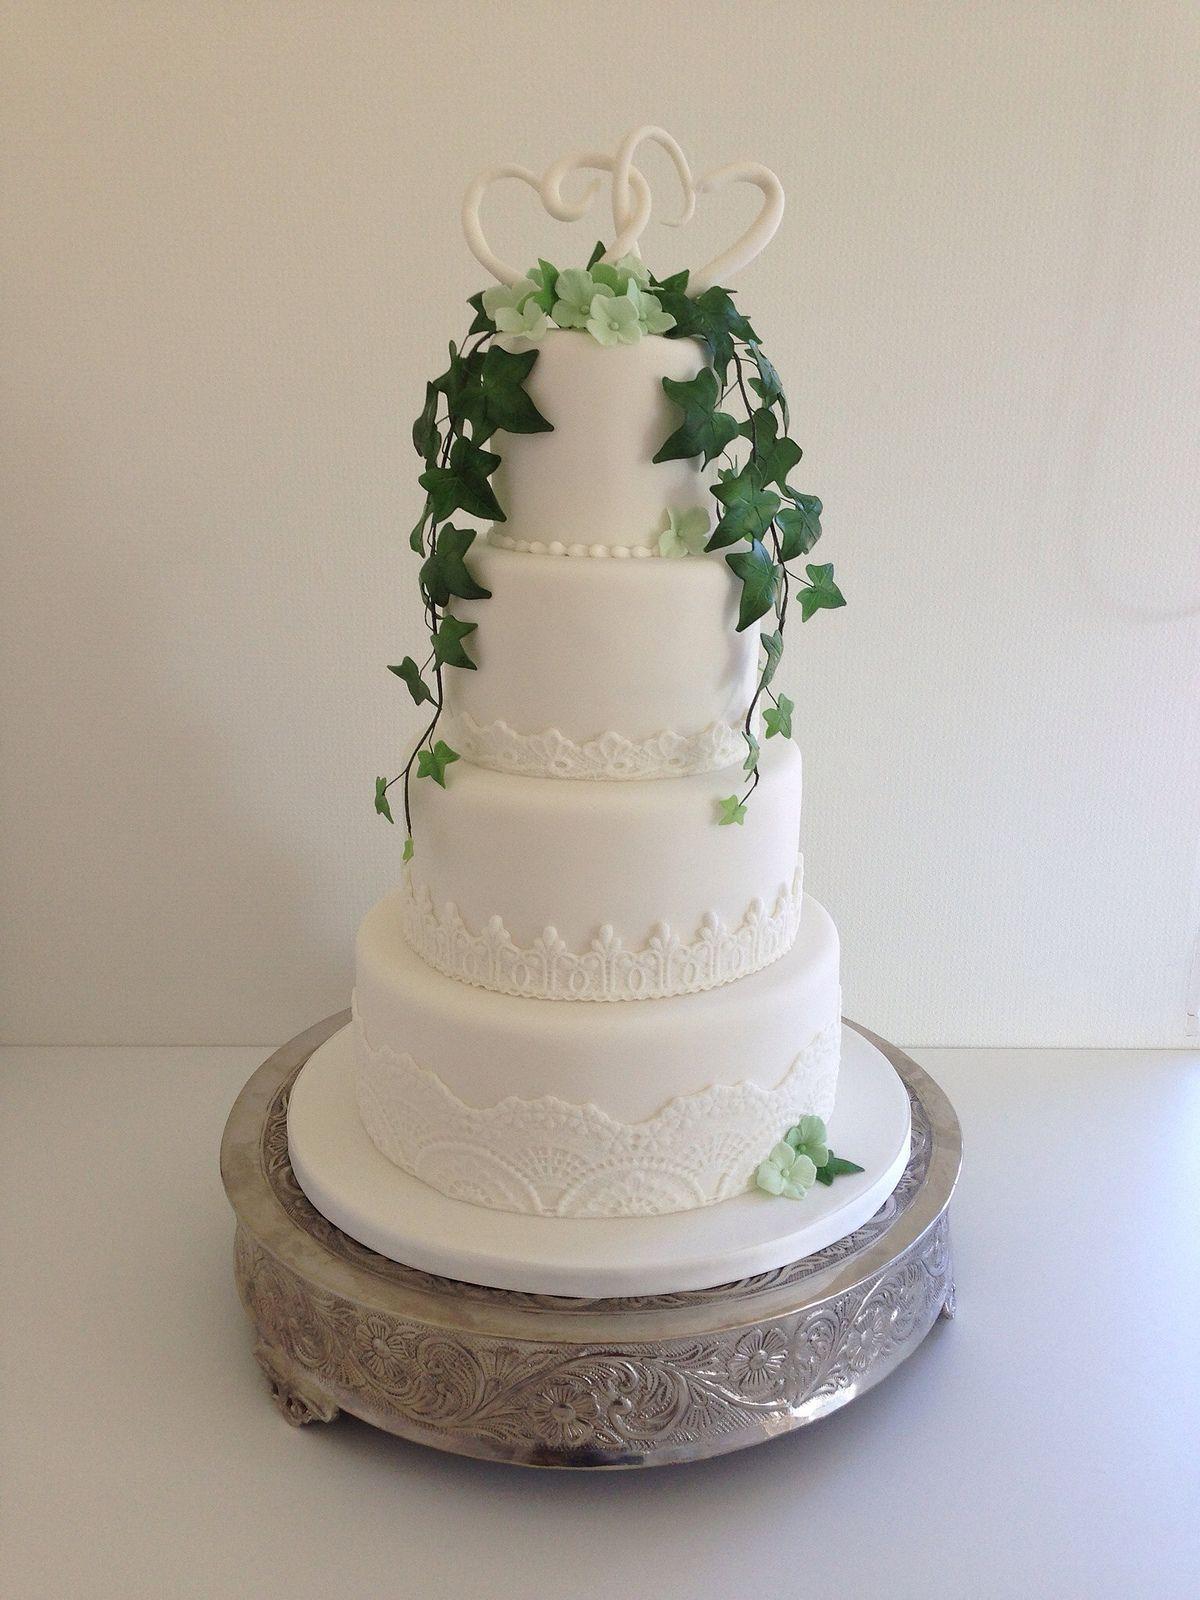 Enchanting Wedding Cakes Kc Pictures - Wedding Idea 2018 ...